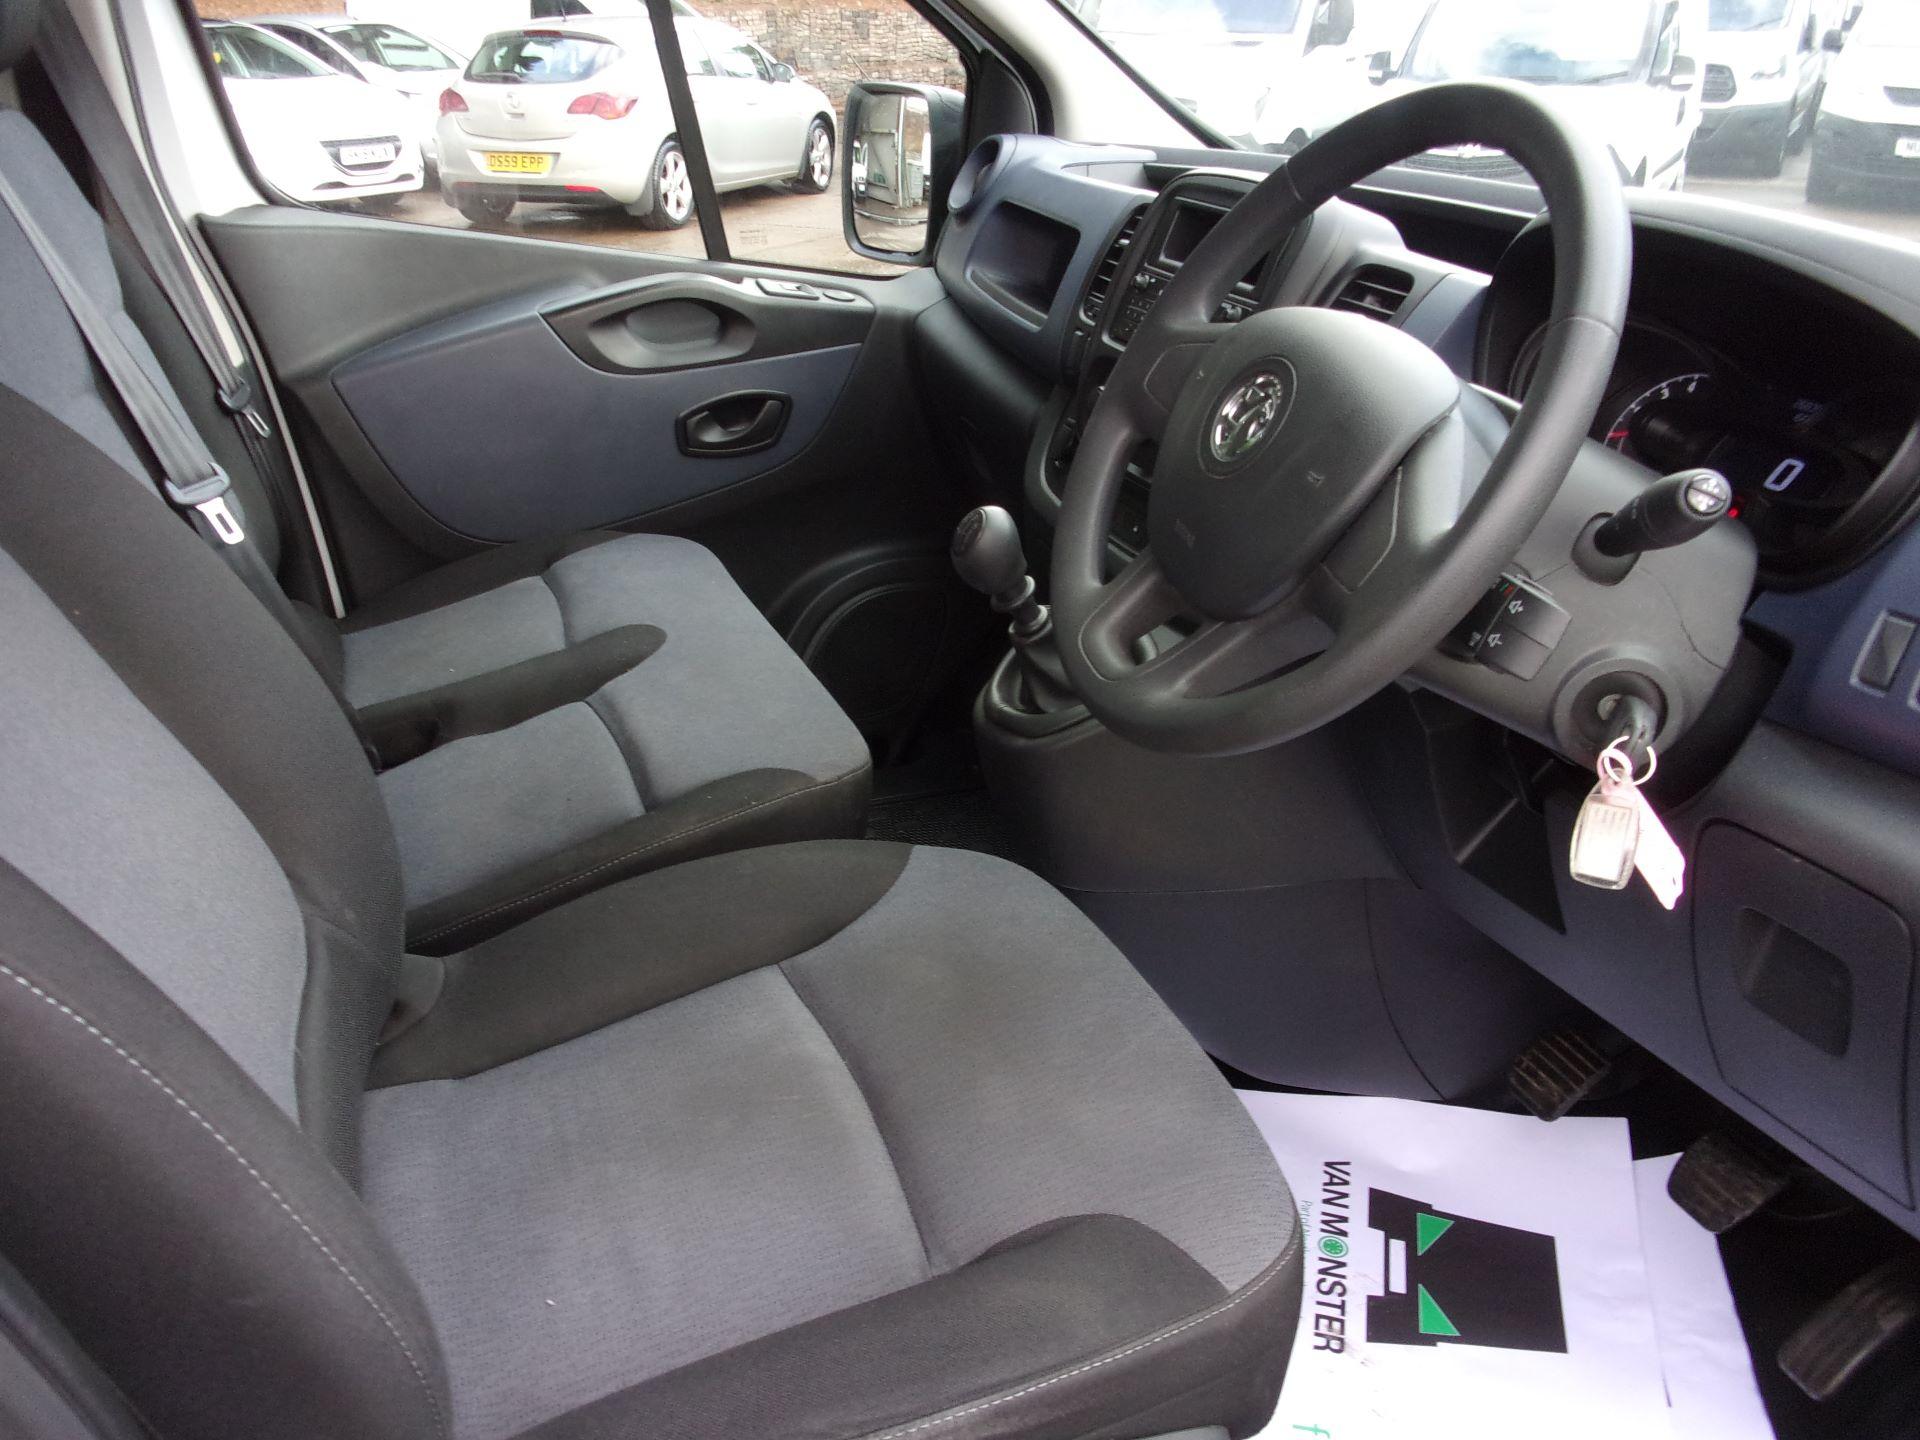 2017 Vauxhall Vivaro L2 H1 2900 1.6 CDTI 120PS EURO 6 (DY67DWG) Image 2